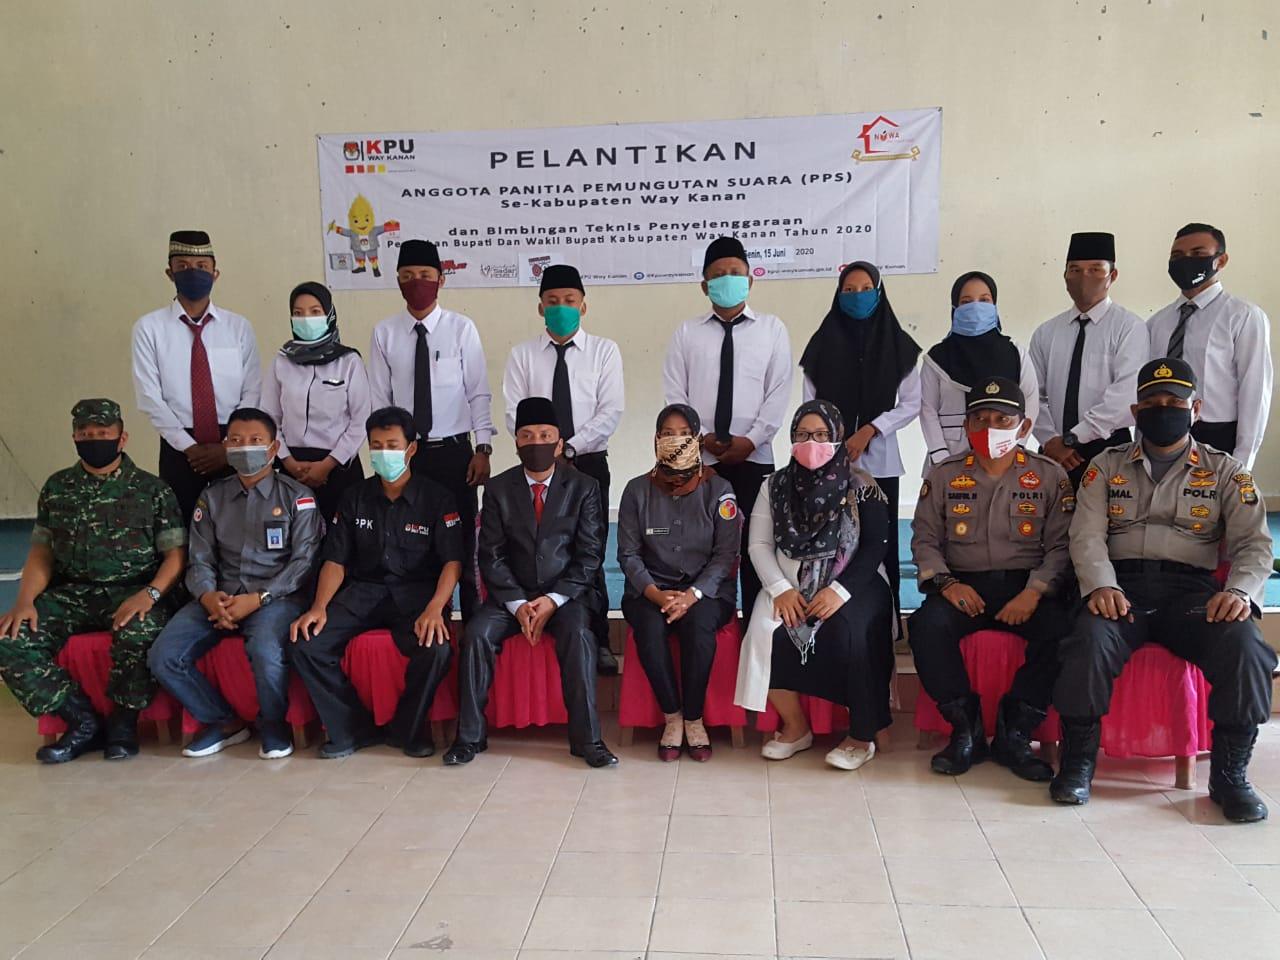 Refki Dharmawan 681 Personil PPS se- Way Kanan Di Lantik